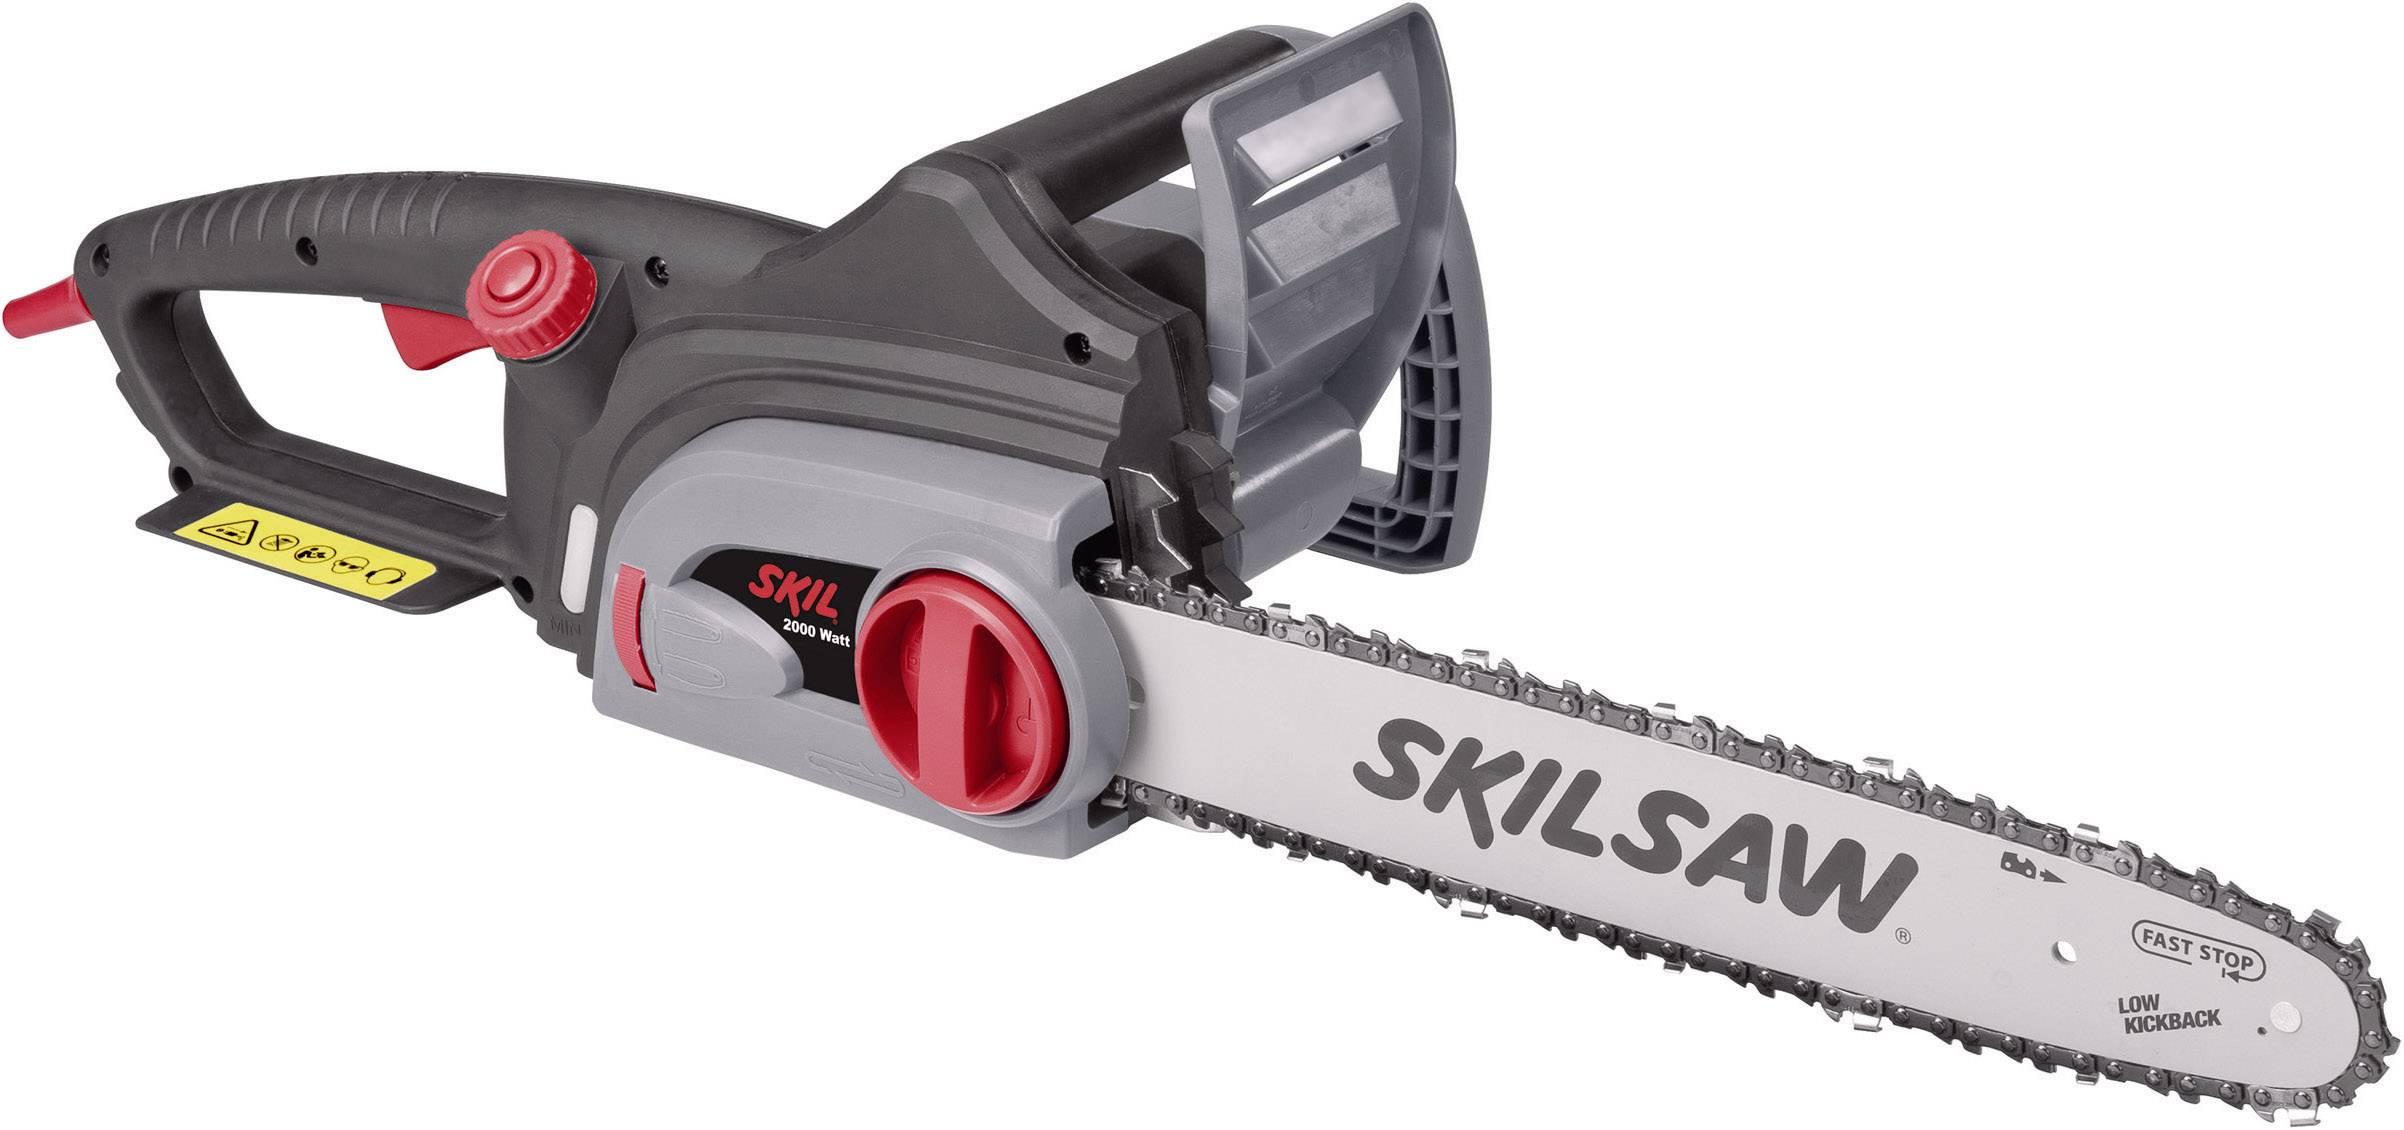 Elektrický/á reťazová píla SKIL 0780 AA, dĺžka čepele 350 mm